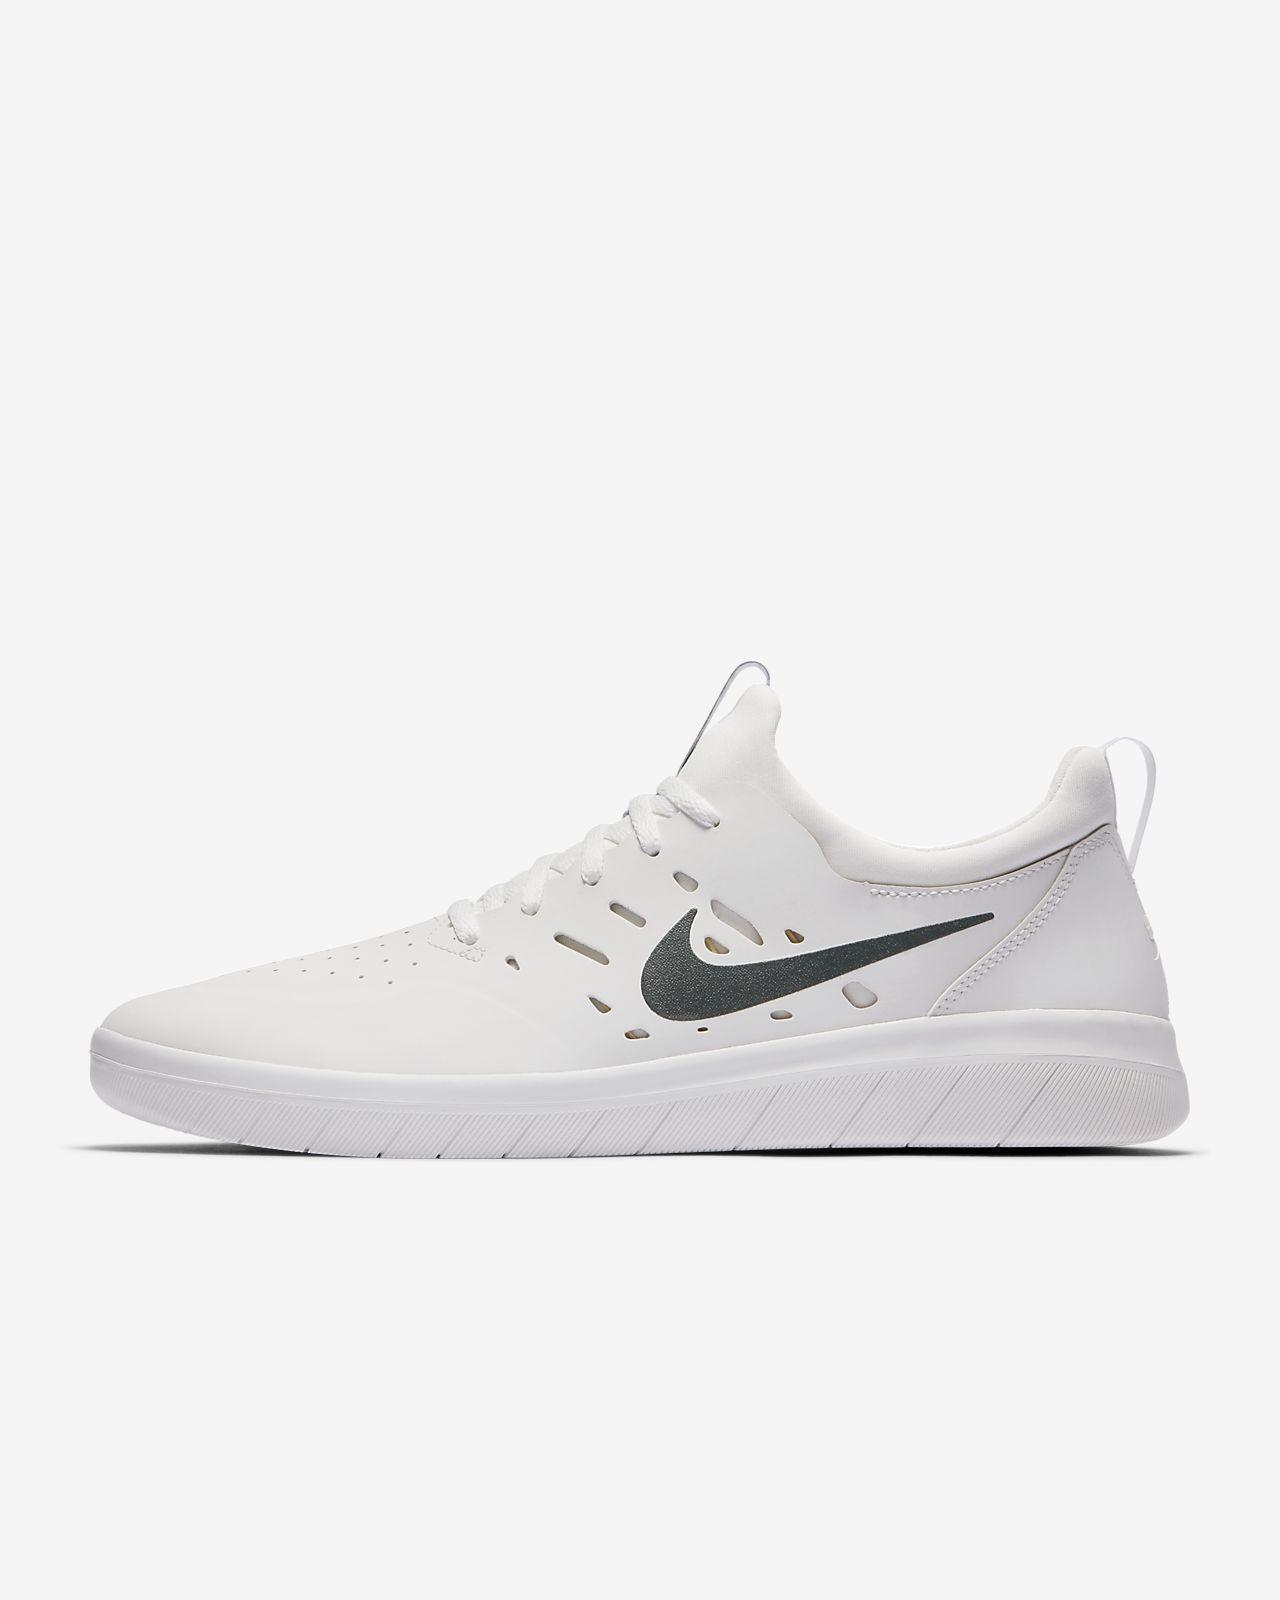 Calzado de skateboarding Nike SB Nyjah Free